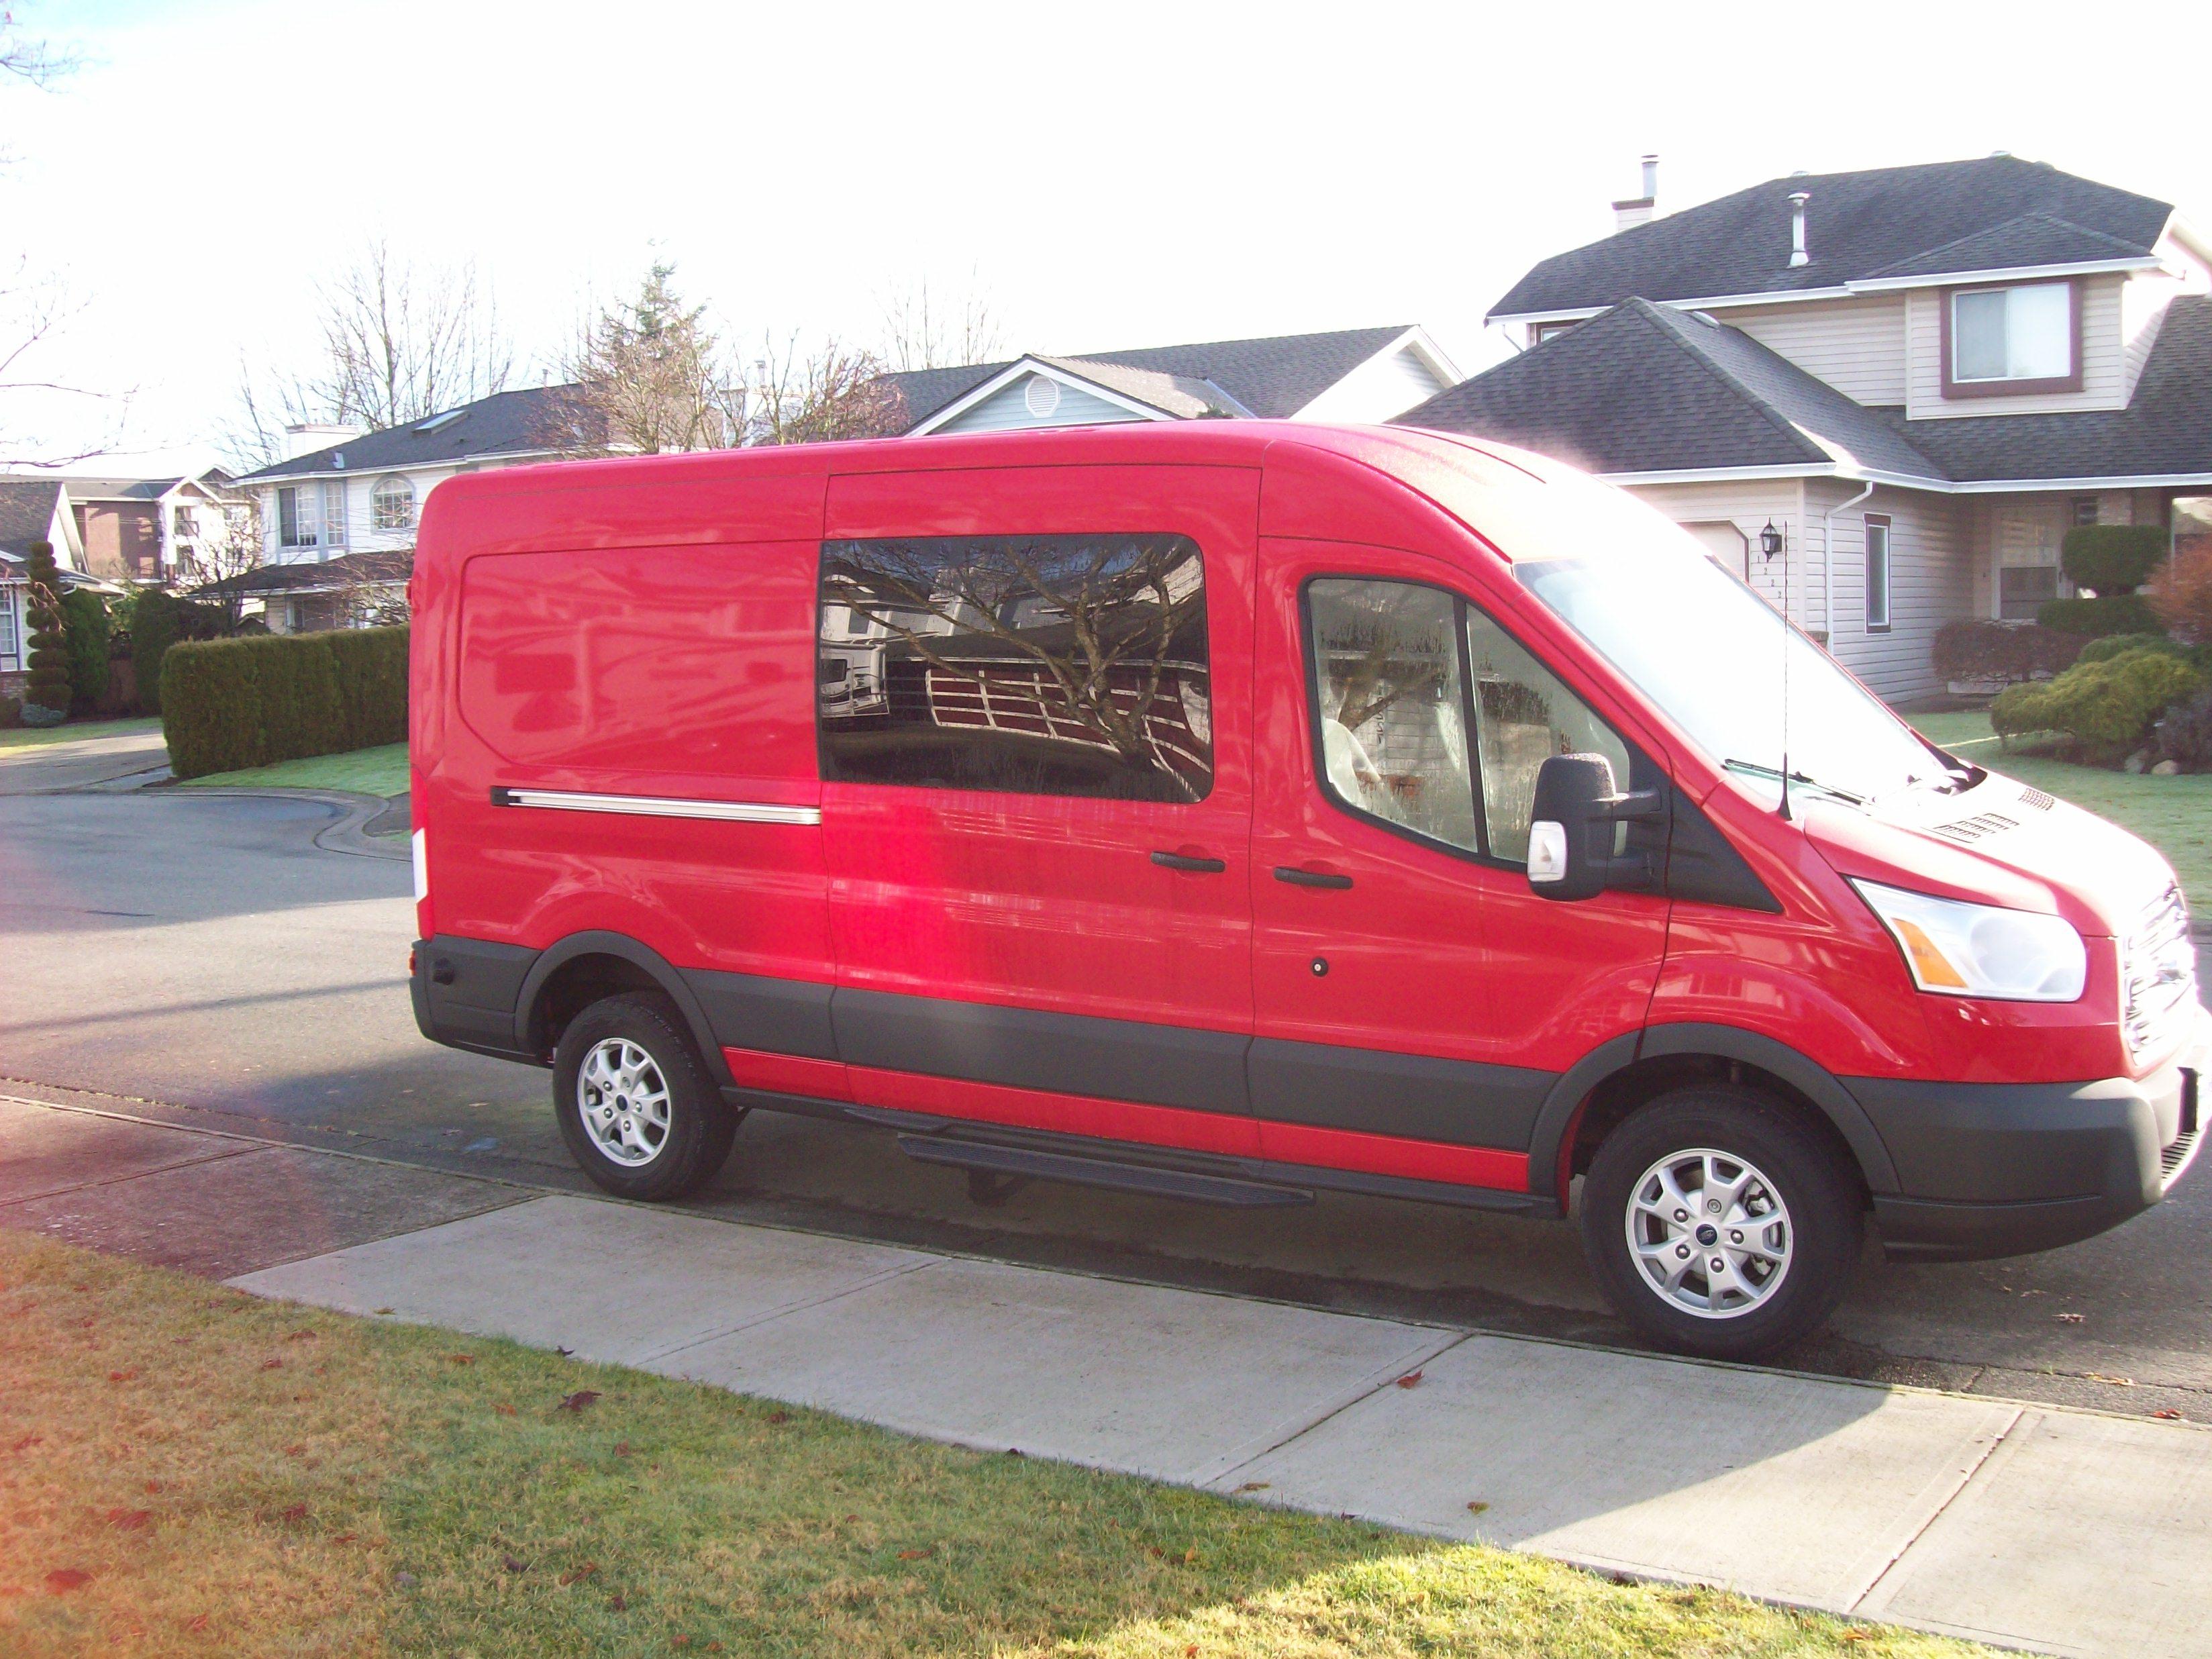 Click image for larger version  Name:Transit Van 003.JPG Views:41 Size:1.11 MB ID:2227544